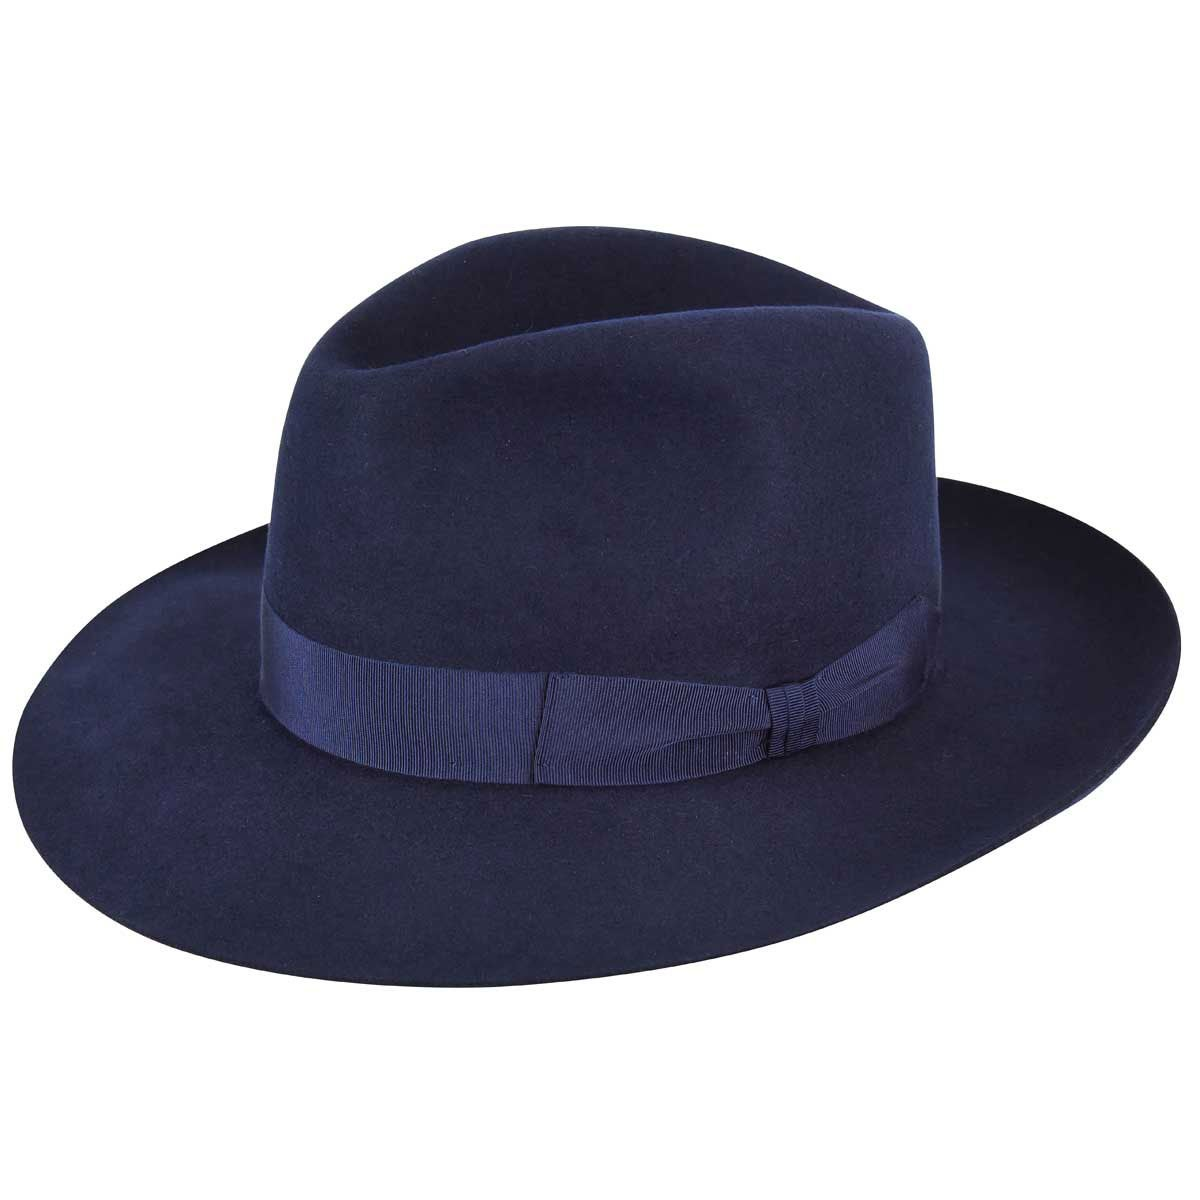 1920s Men's Hats – 8 Popular Styles Super Barbisio Fur Felt Fedora $105.00 AT vintagedancer.com